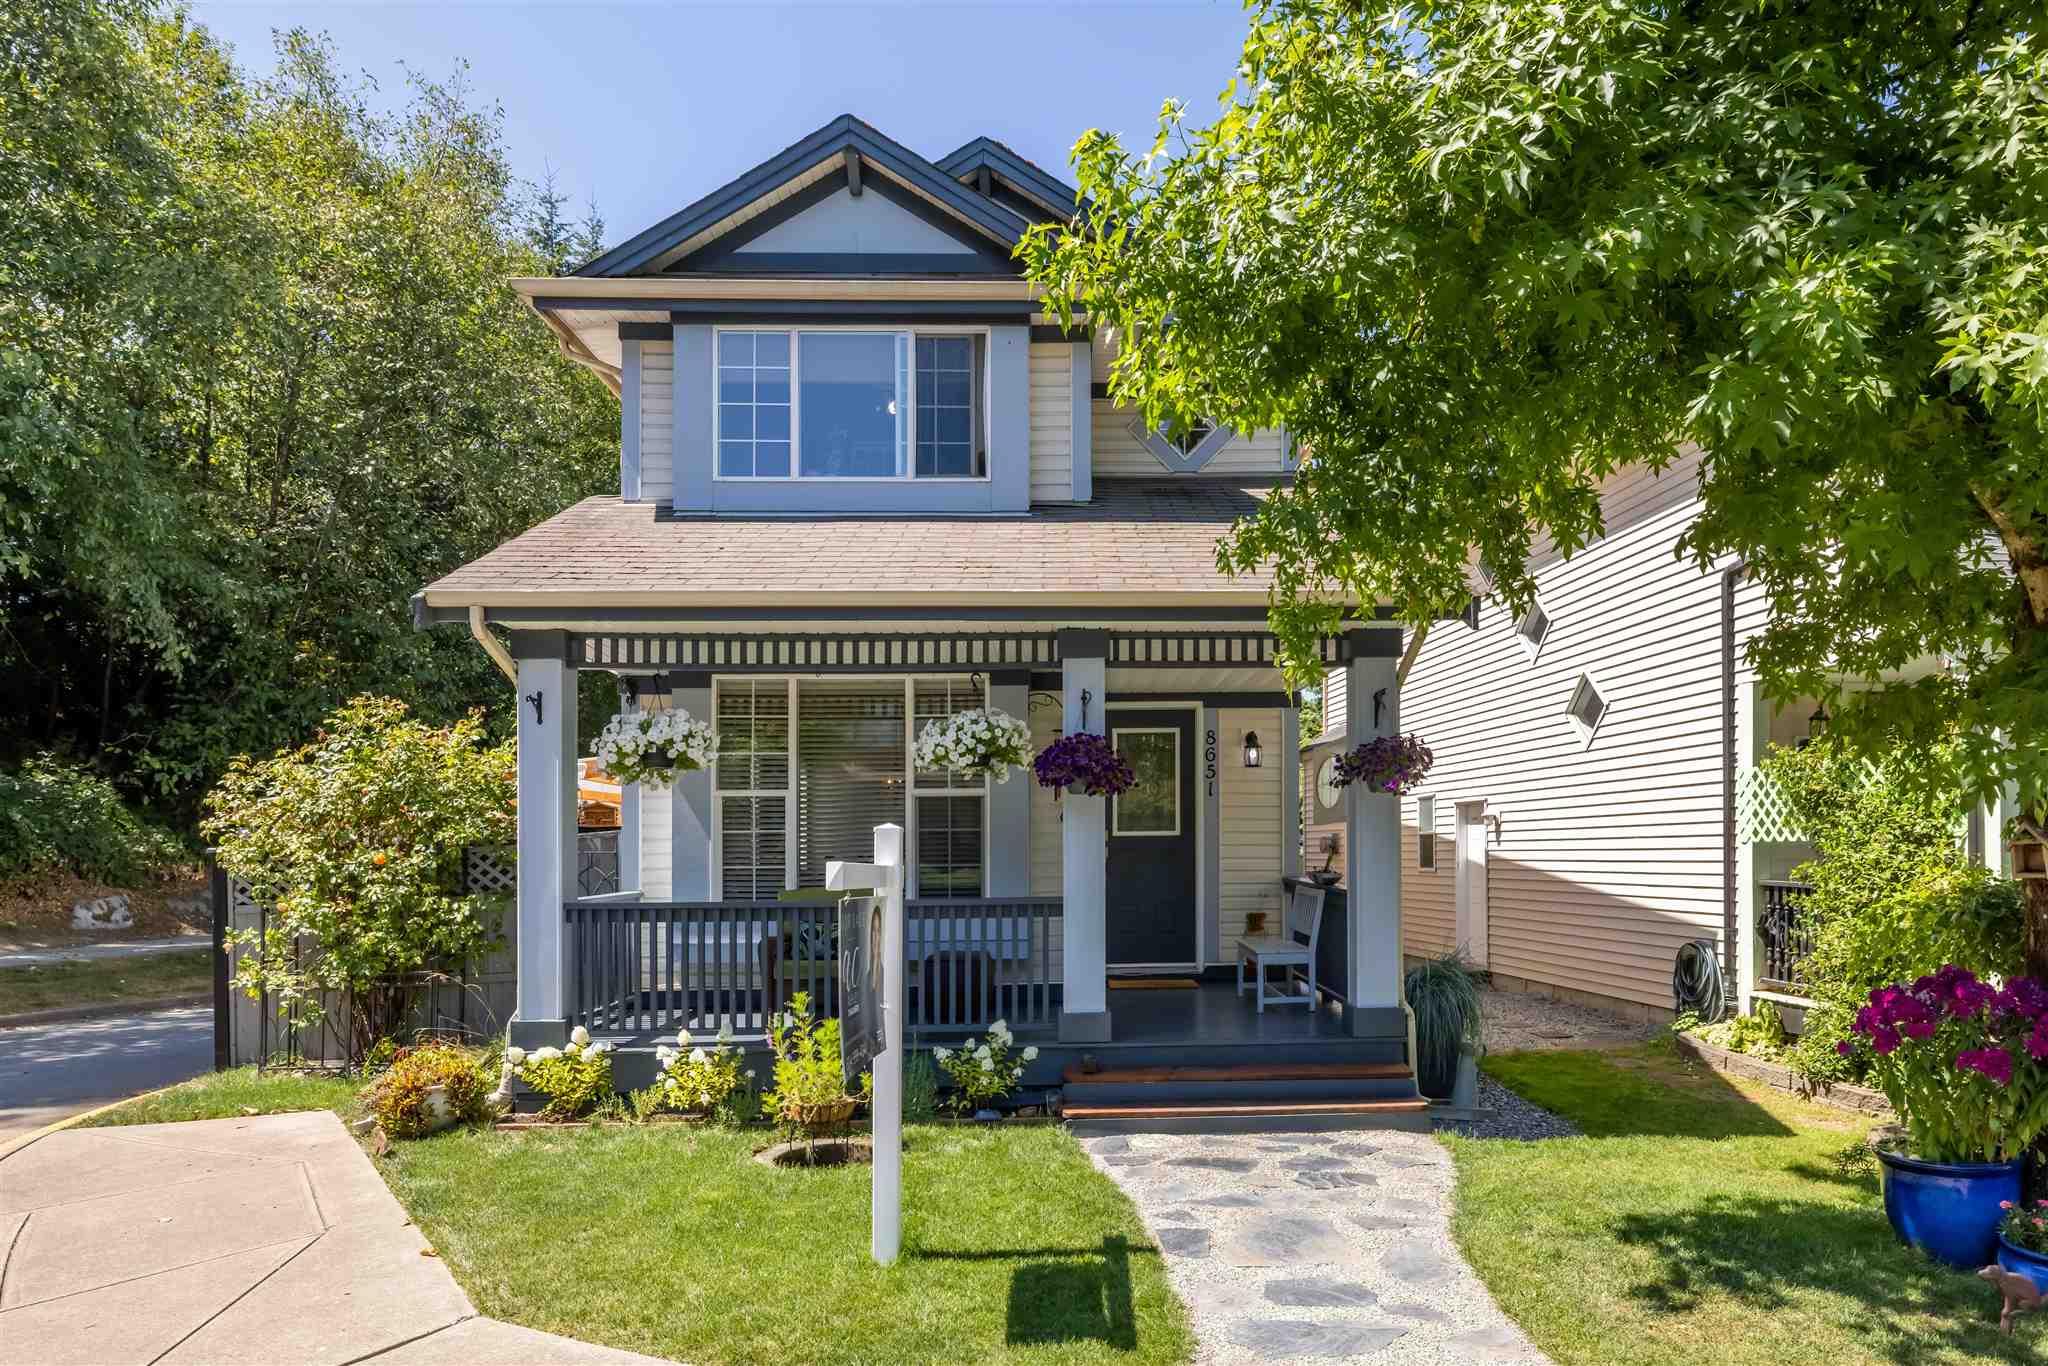 8651 206B STREET - Walnut Grove House/Single Family for sale, 3 Bedrooms (R2605052) - #1